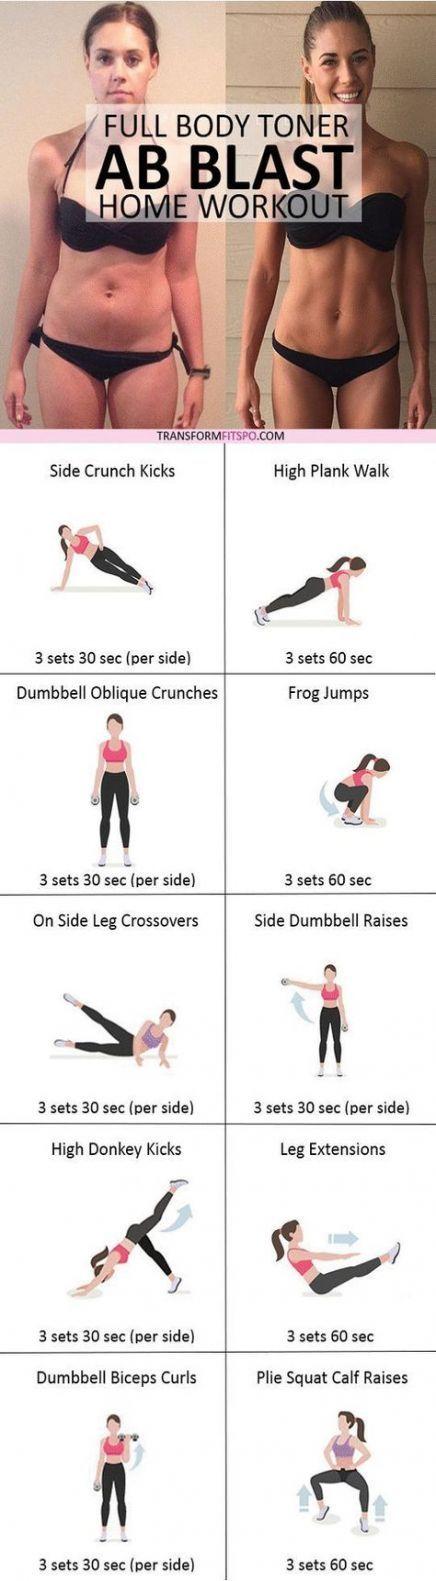 Super Fitness Frauen Abs 31+ Ideas #fitness